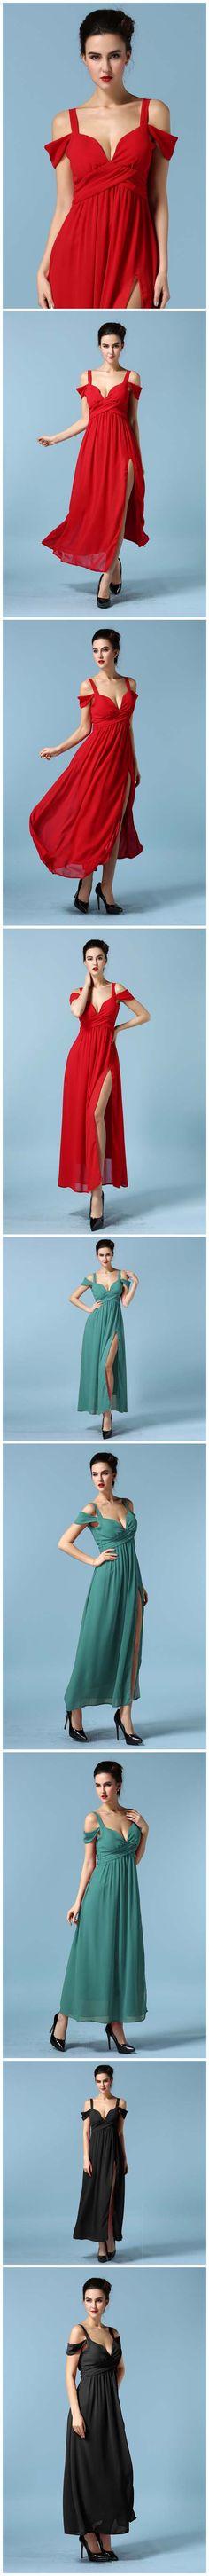 V Cut Chiffon Long Slit Dress